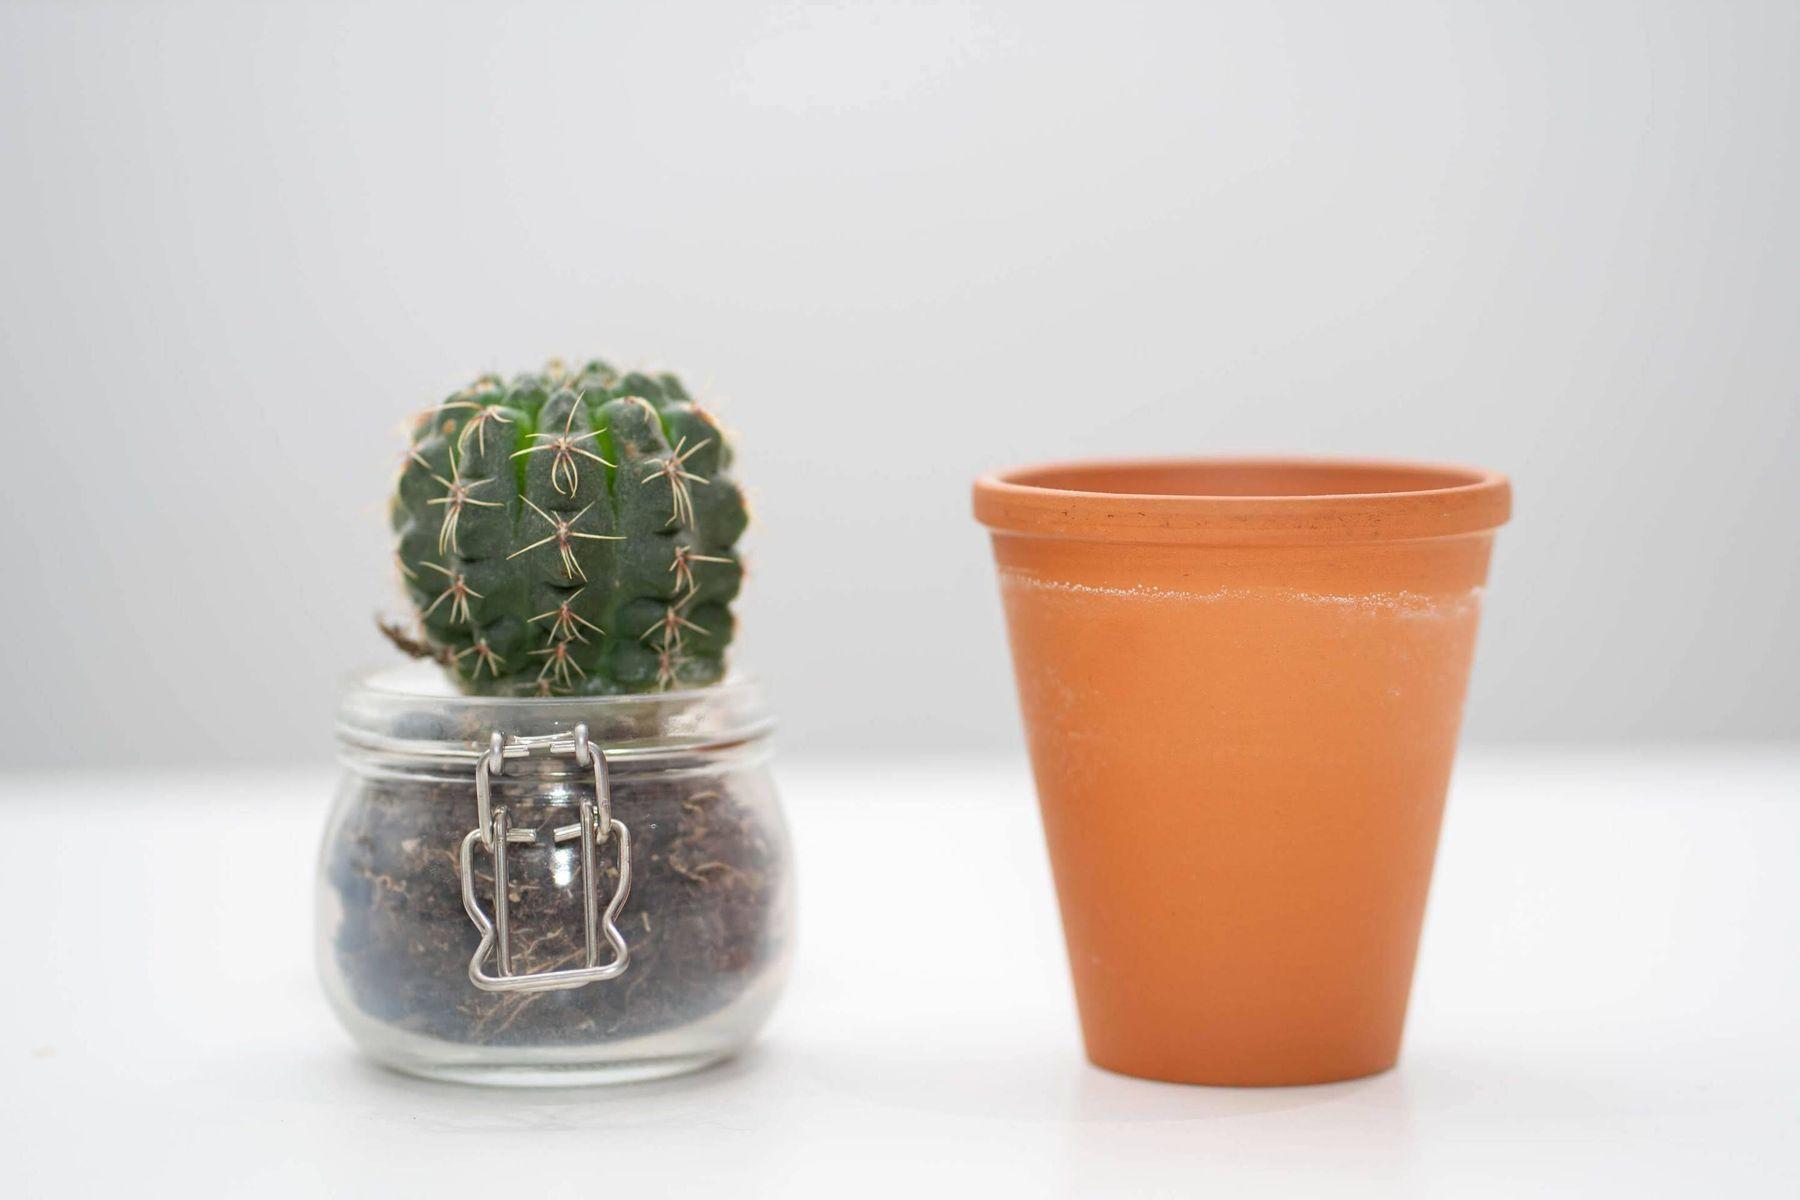 repotting a houseplant